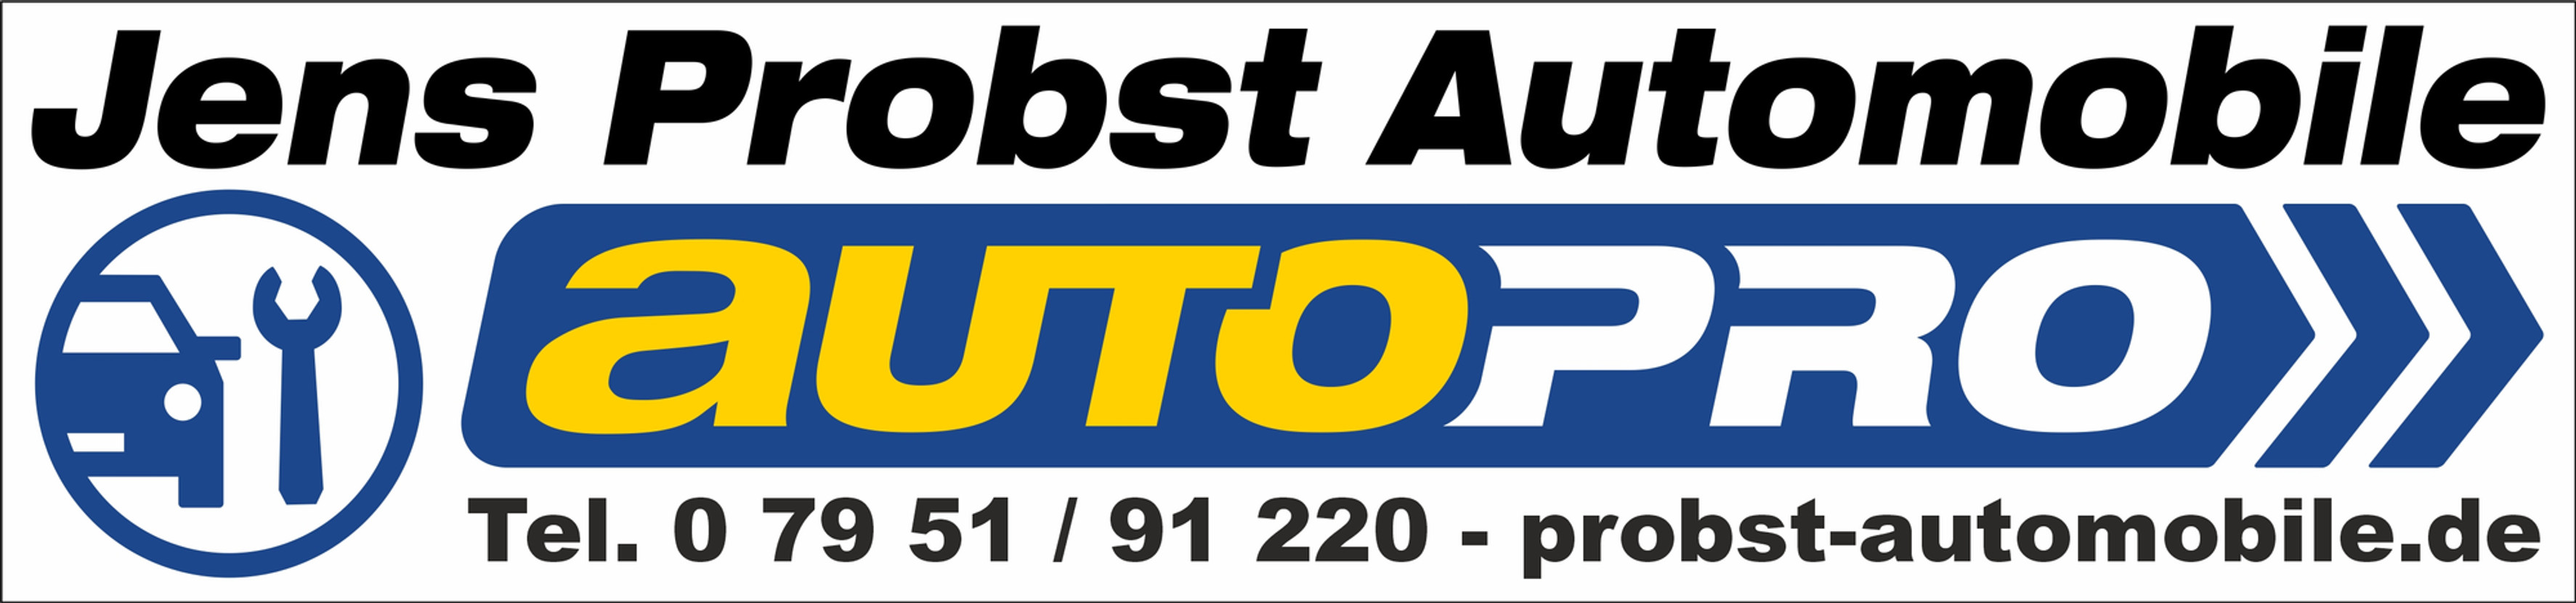 Jens Probst Automobile